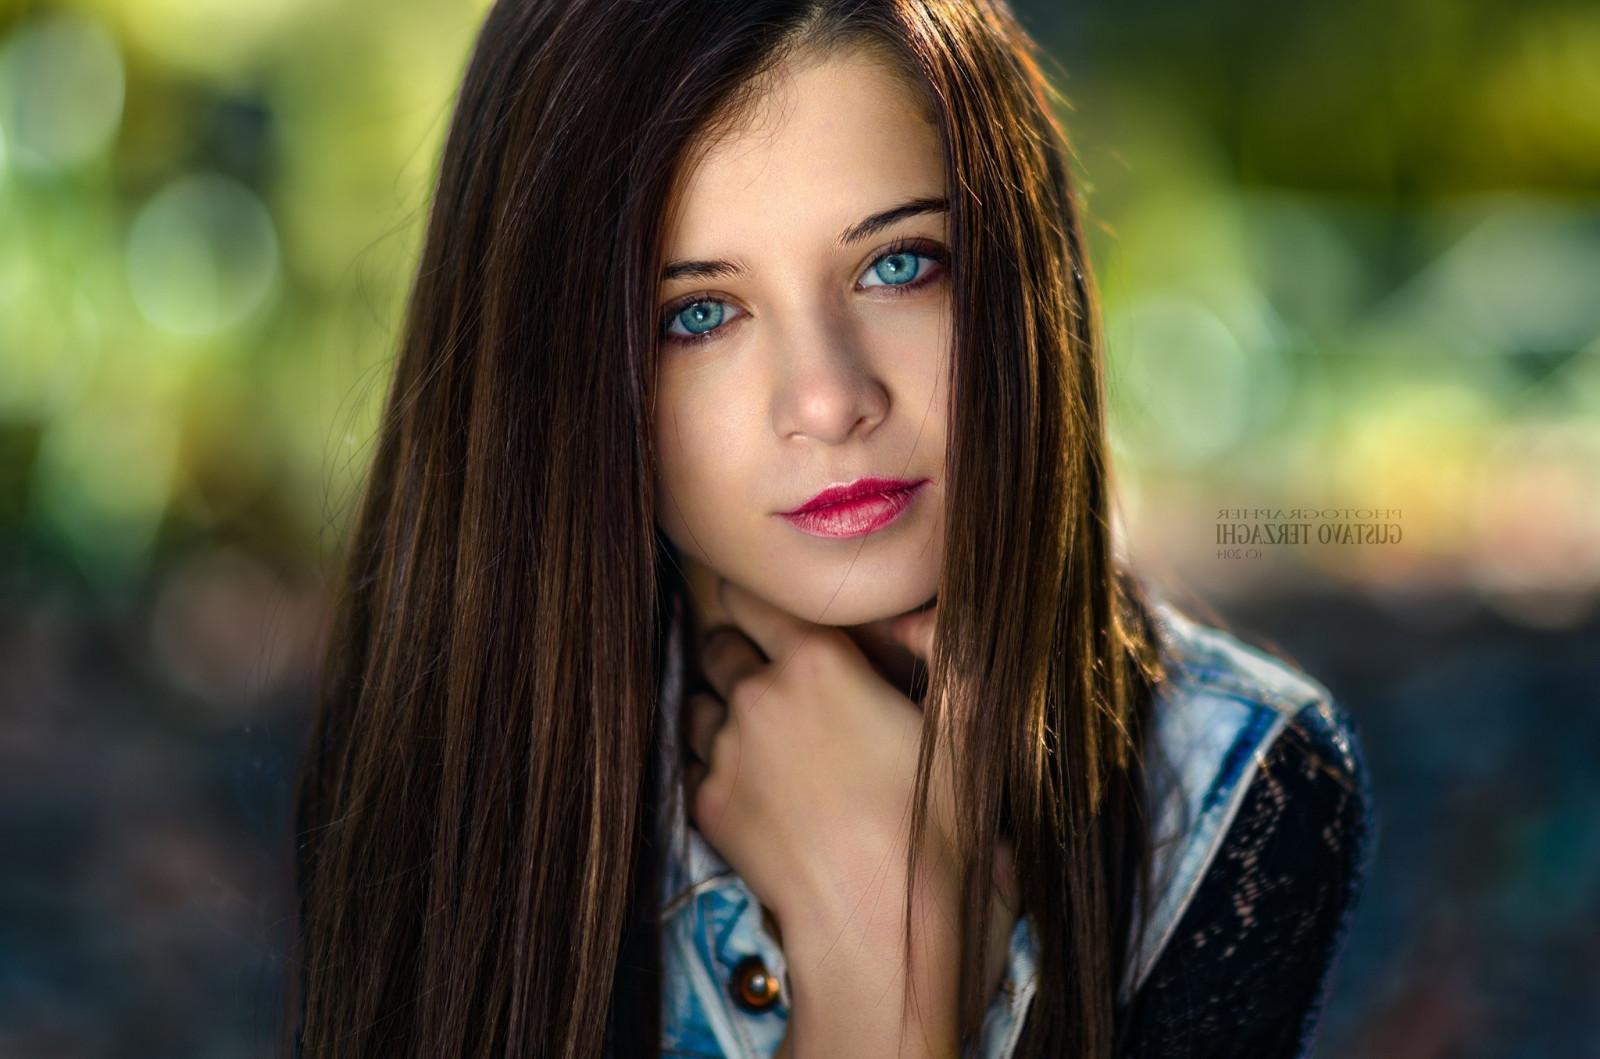 Wallpaper Face Women Model Long Hair Blue Eyes: Wallpaper : Face, Women, Model, Depth Of Field, Straight